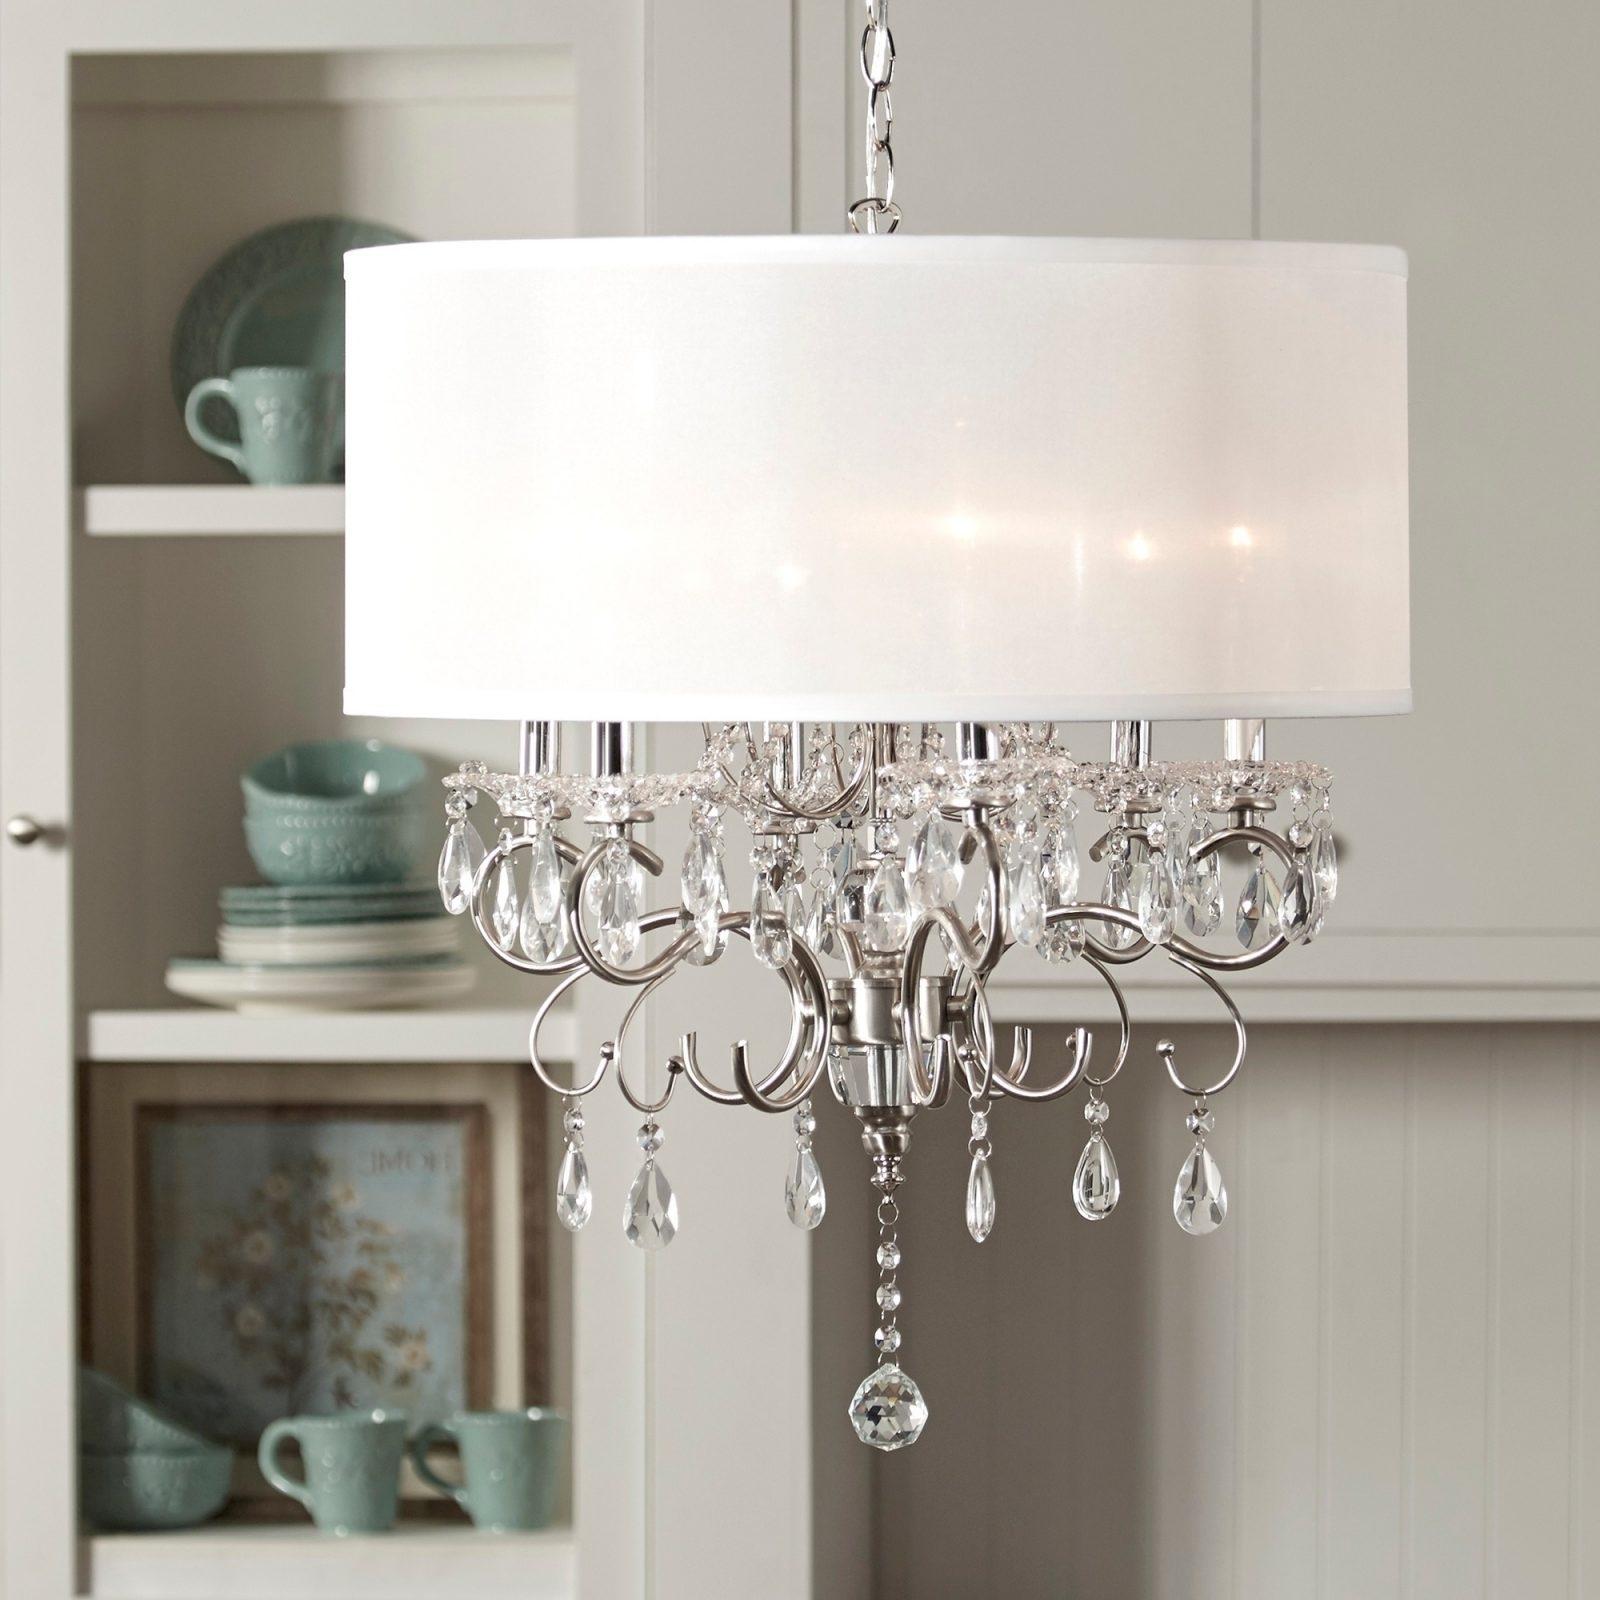 Bathroom Crystal Light Fixtures Swarovski Lighting Faucets With Most Popular Crystal Bathroom Chandelier (View 13 of 15)